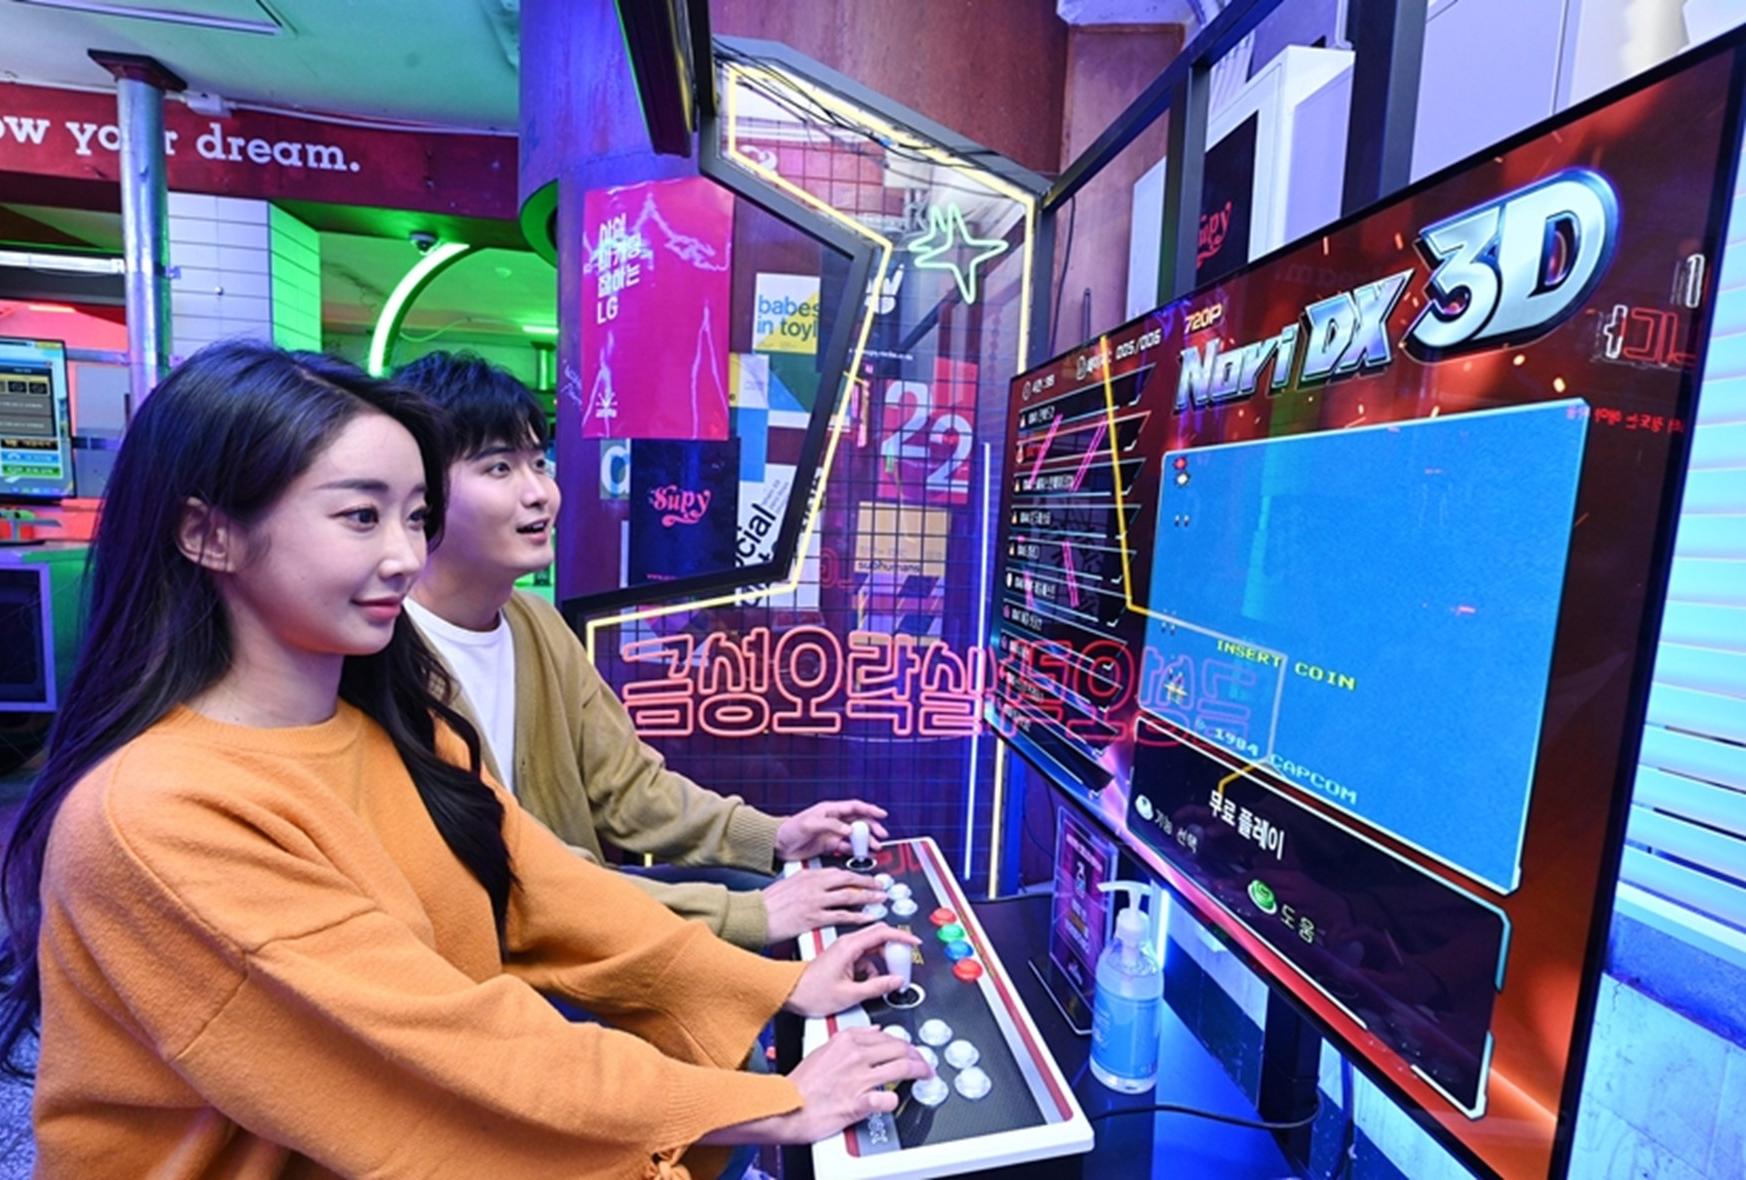 Retro Meets Next-Gen at Goldstar Arcade in Seoul